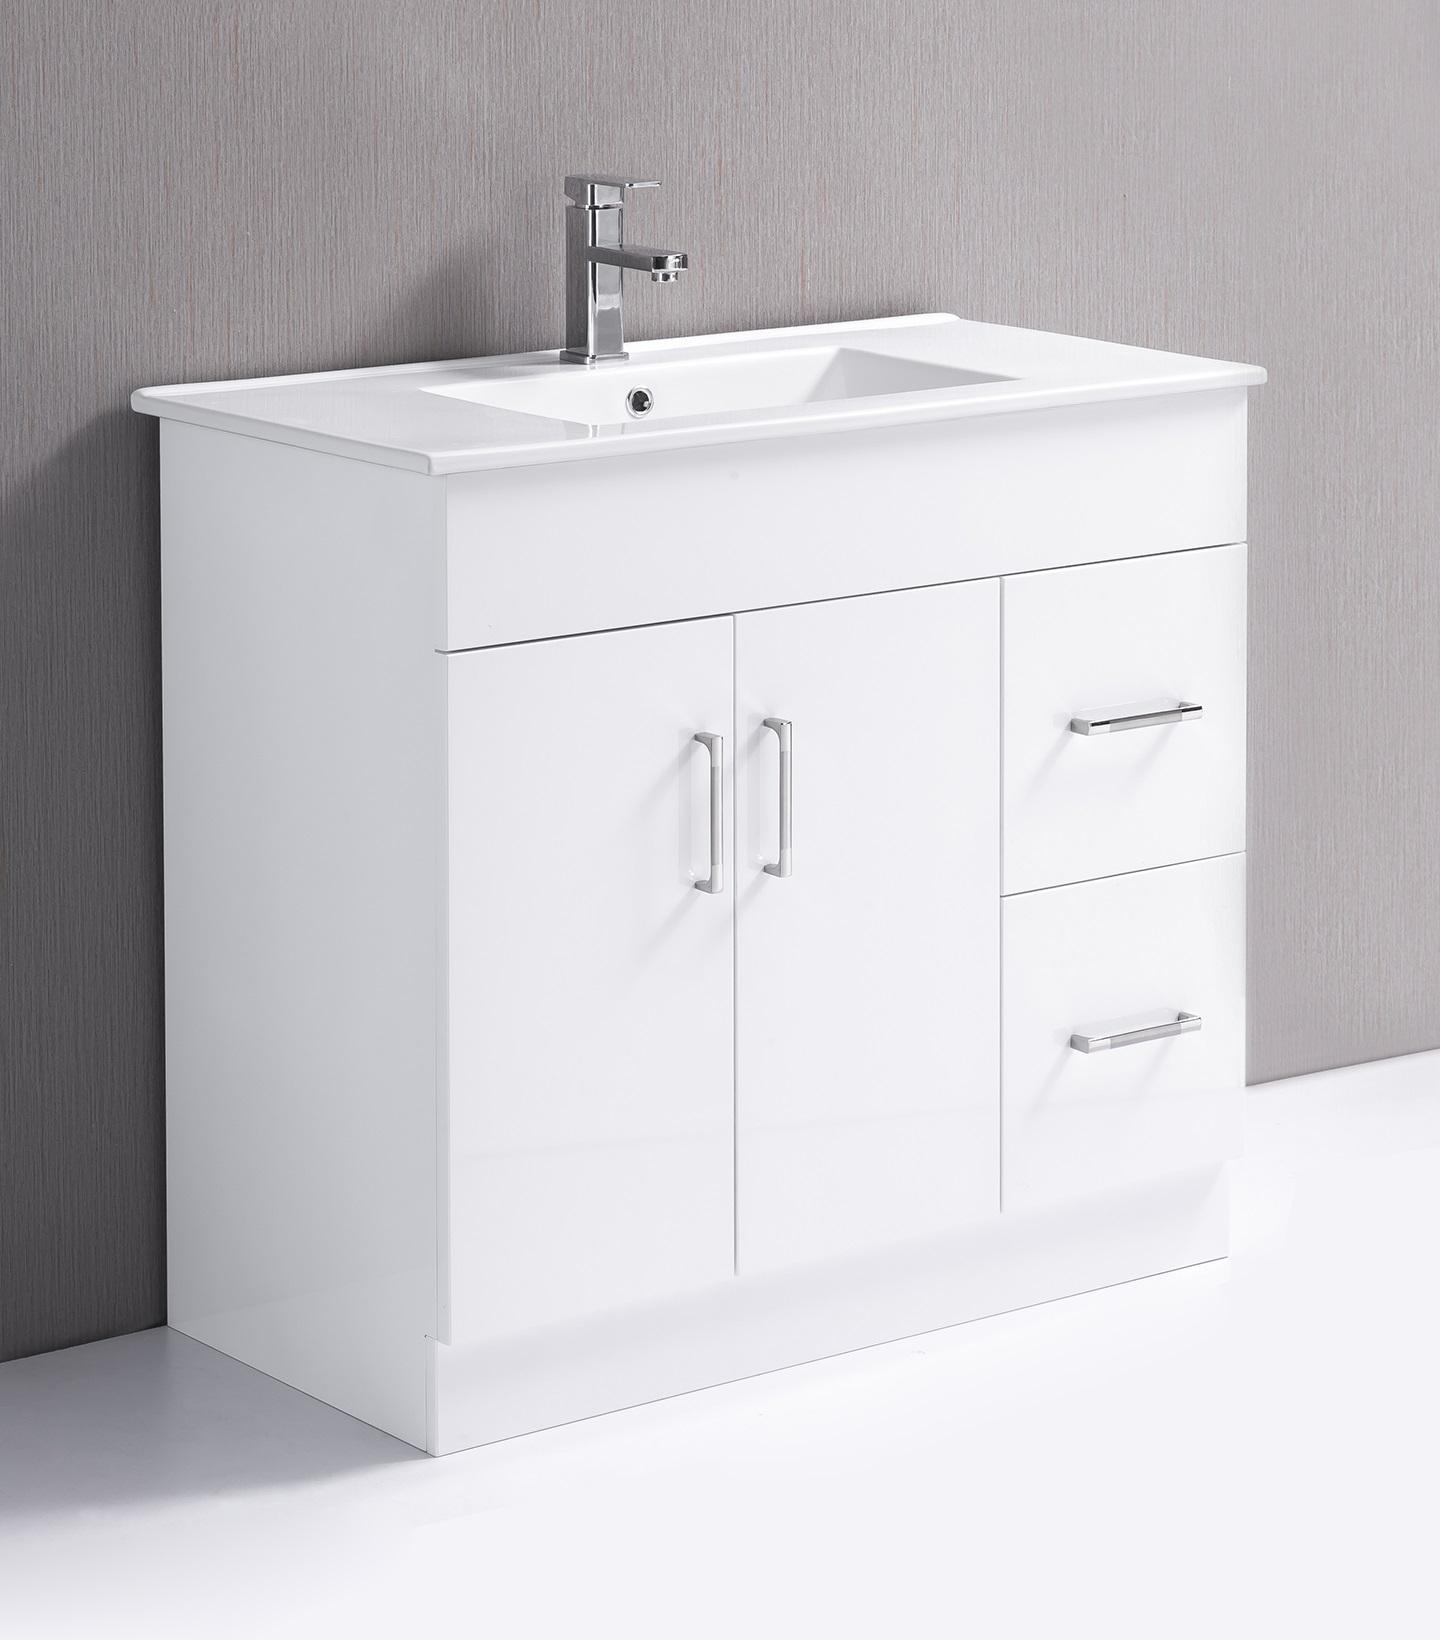 900mm Bathroom Vanity Unit, High Gloss Finish, Ceramic Basin - Della Francesca  Z2598